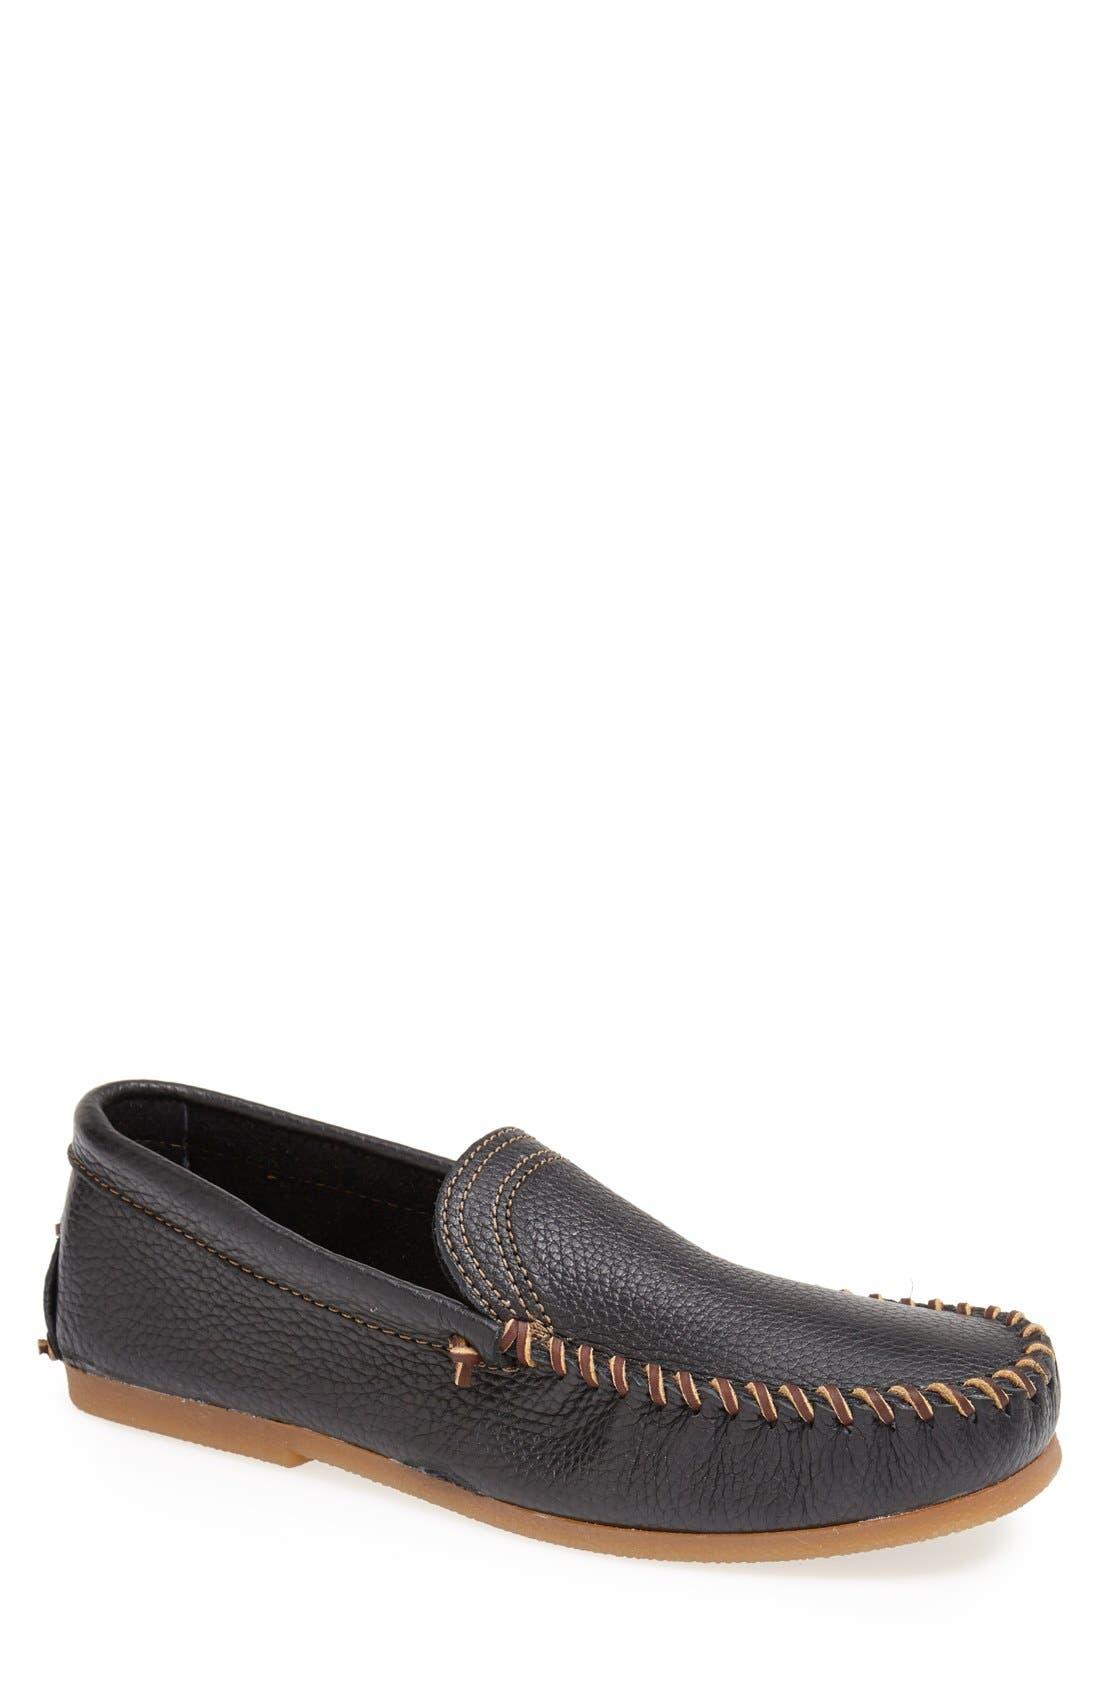 Venetian Loafer,                         Main,                         color, Black